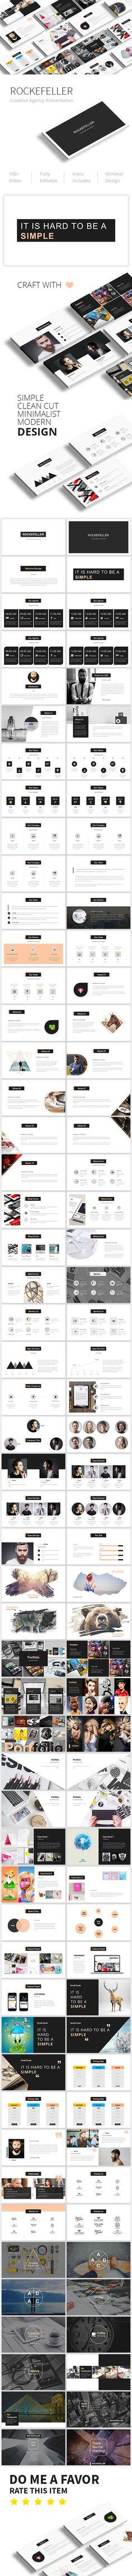 Rockefeller Creative Powerpoint Presentation https://elements-cover-images-0.imgix.net/bf2d9d12-93b2-4b9b-80fc-b55f9e07041e?w=900&fit=max&auto=compress%2Cformat&s=ca58b3a6ac2f3943e0b4ecd6eb982aad